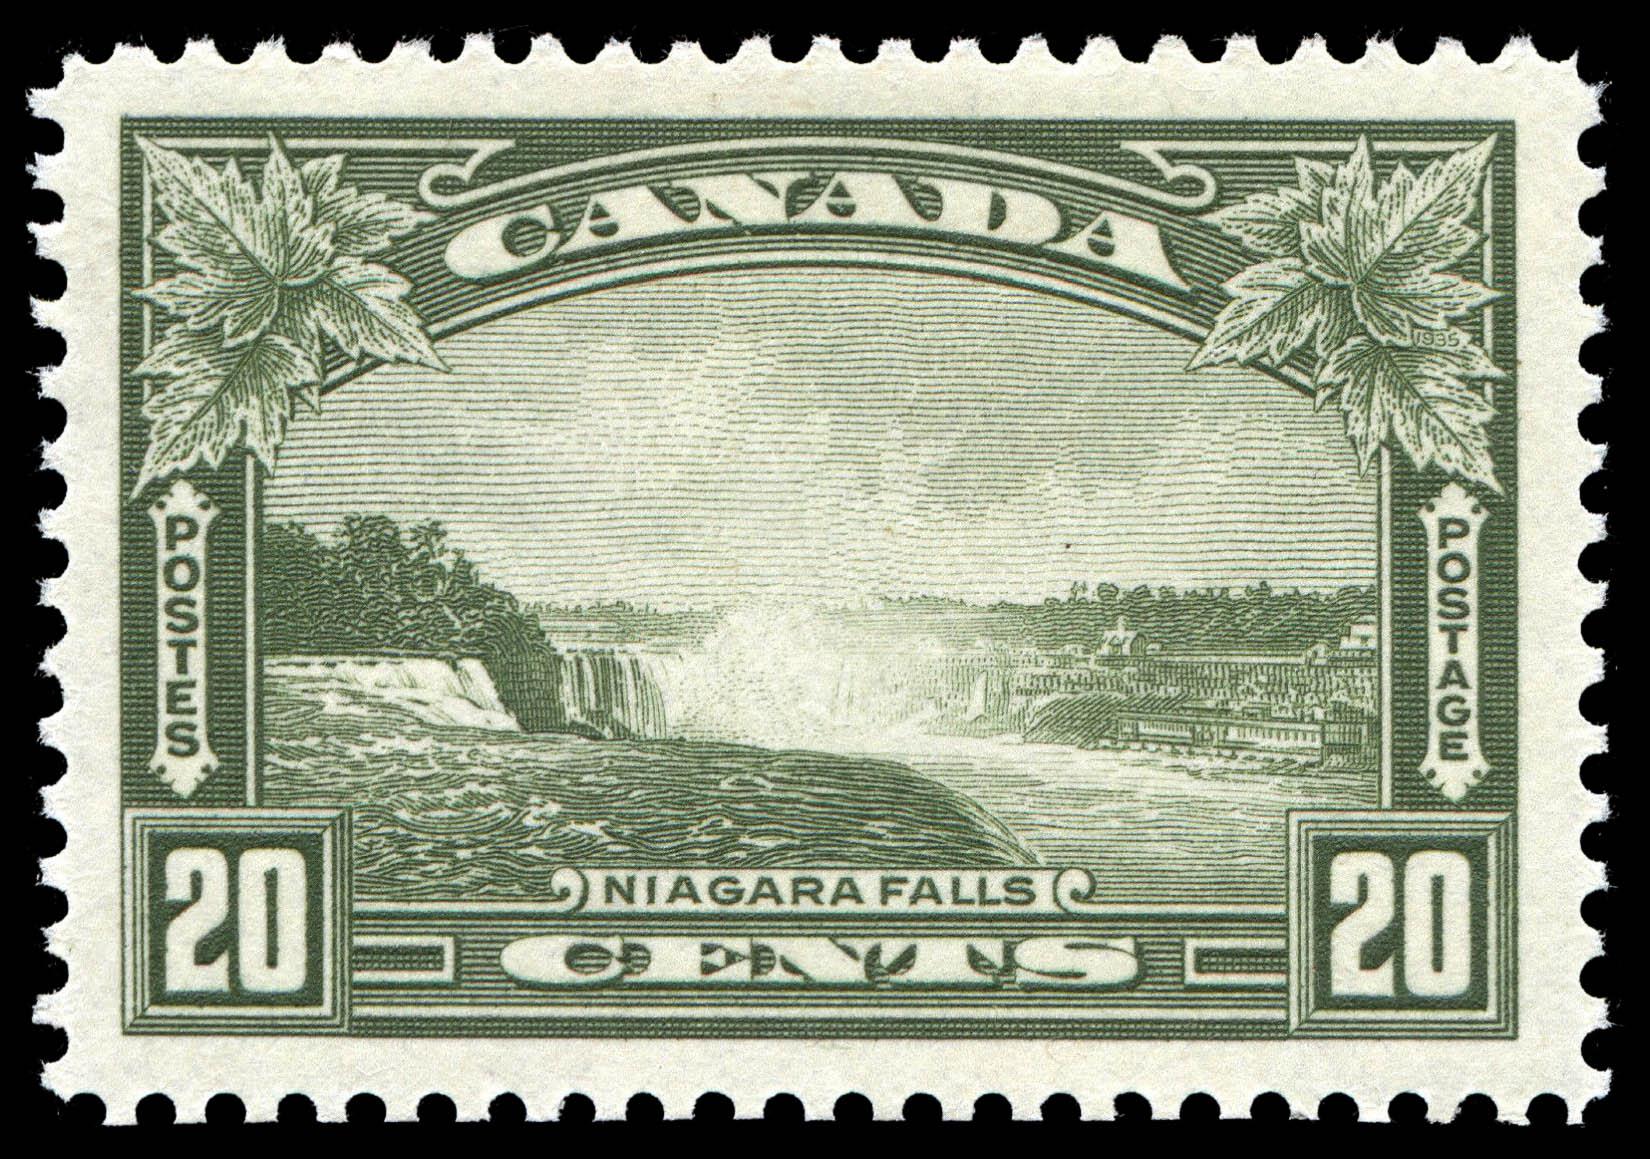 Niagara Falls Canada Postage Stamp